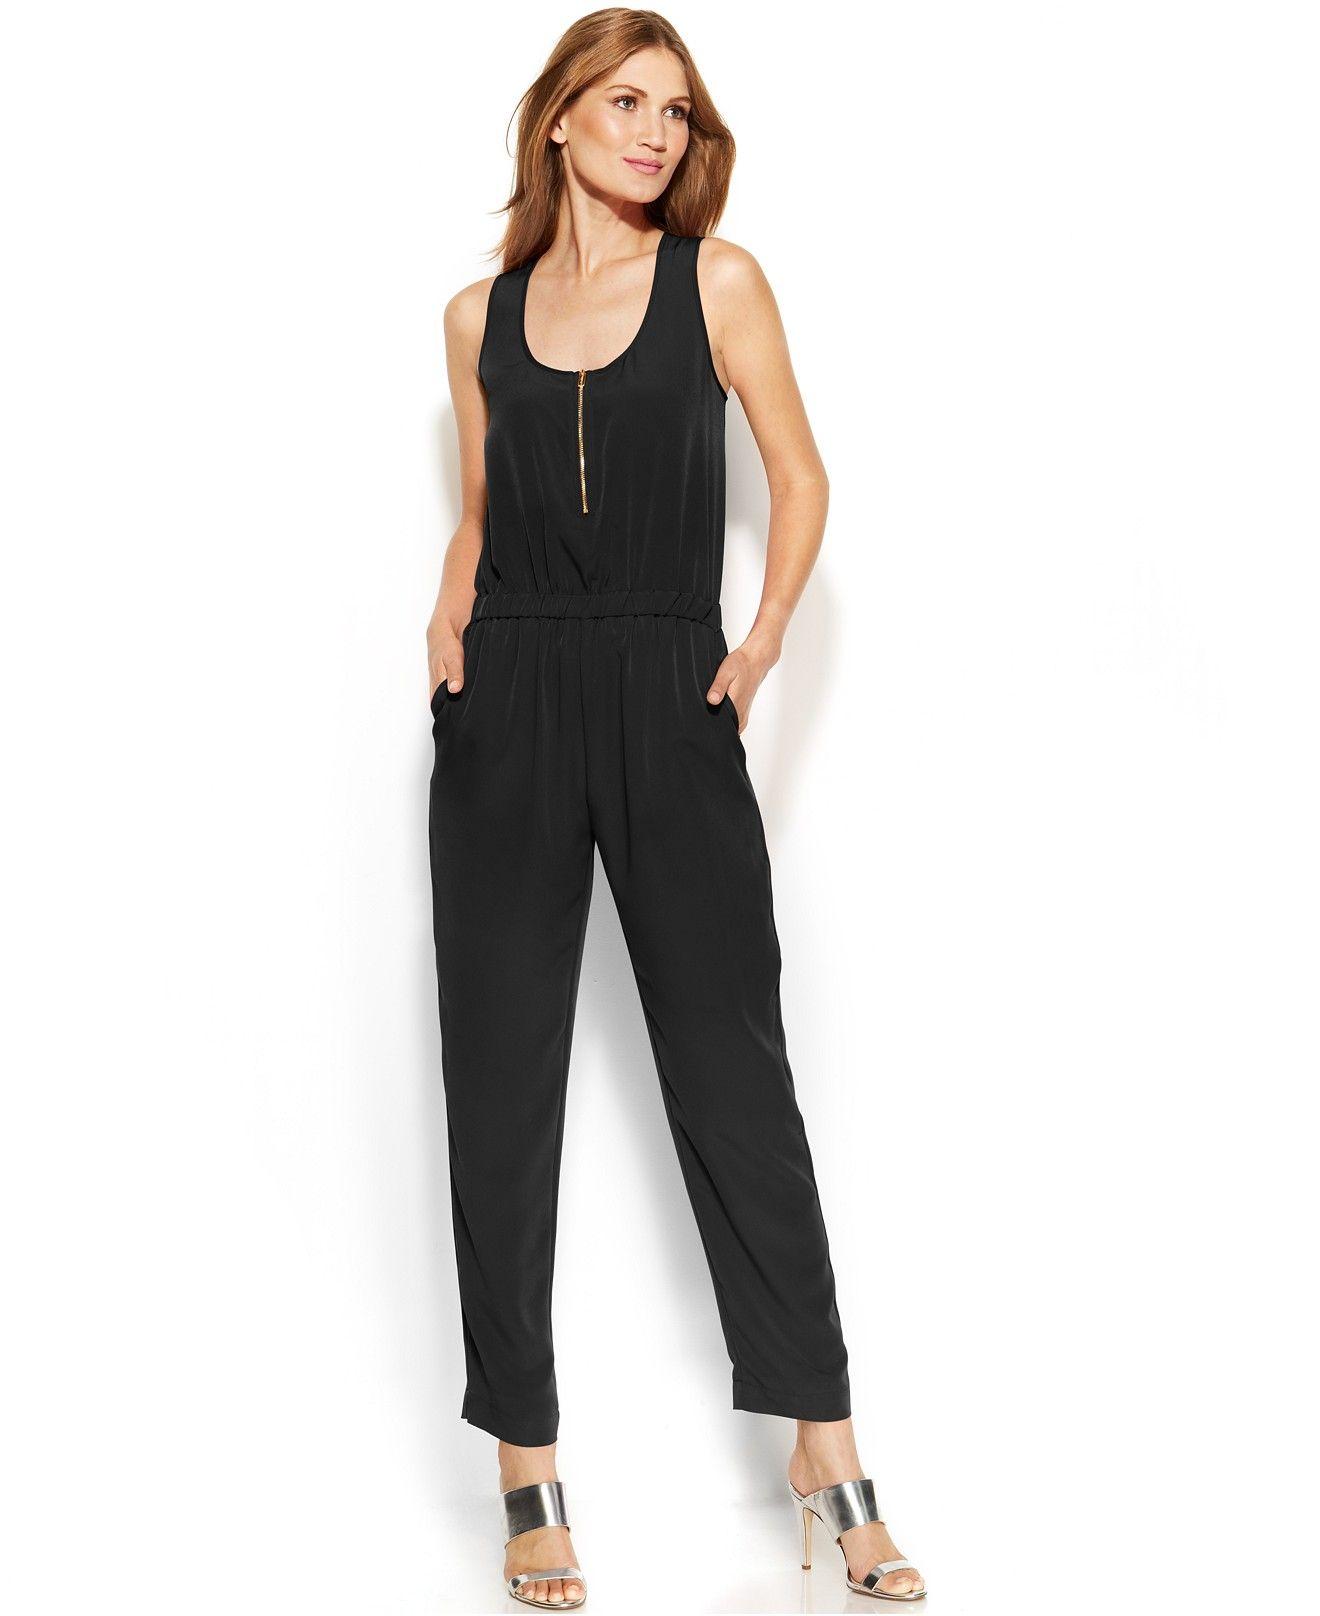 Calvin Klein Sleeveless Half Zip Jumpsuit Pants Capris Women